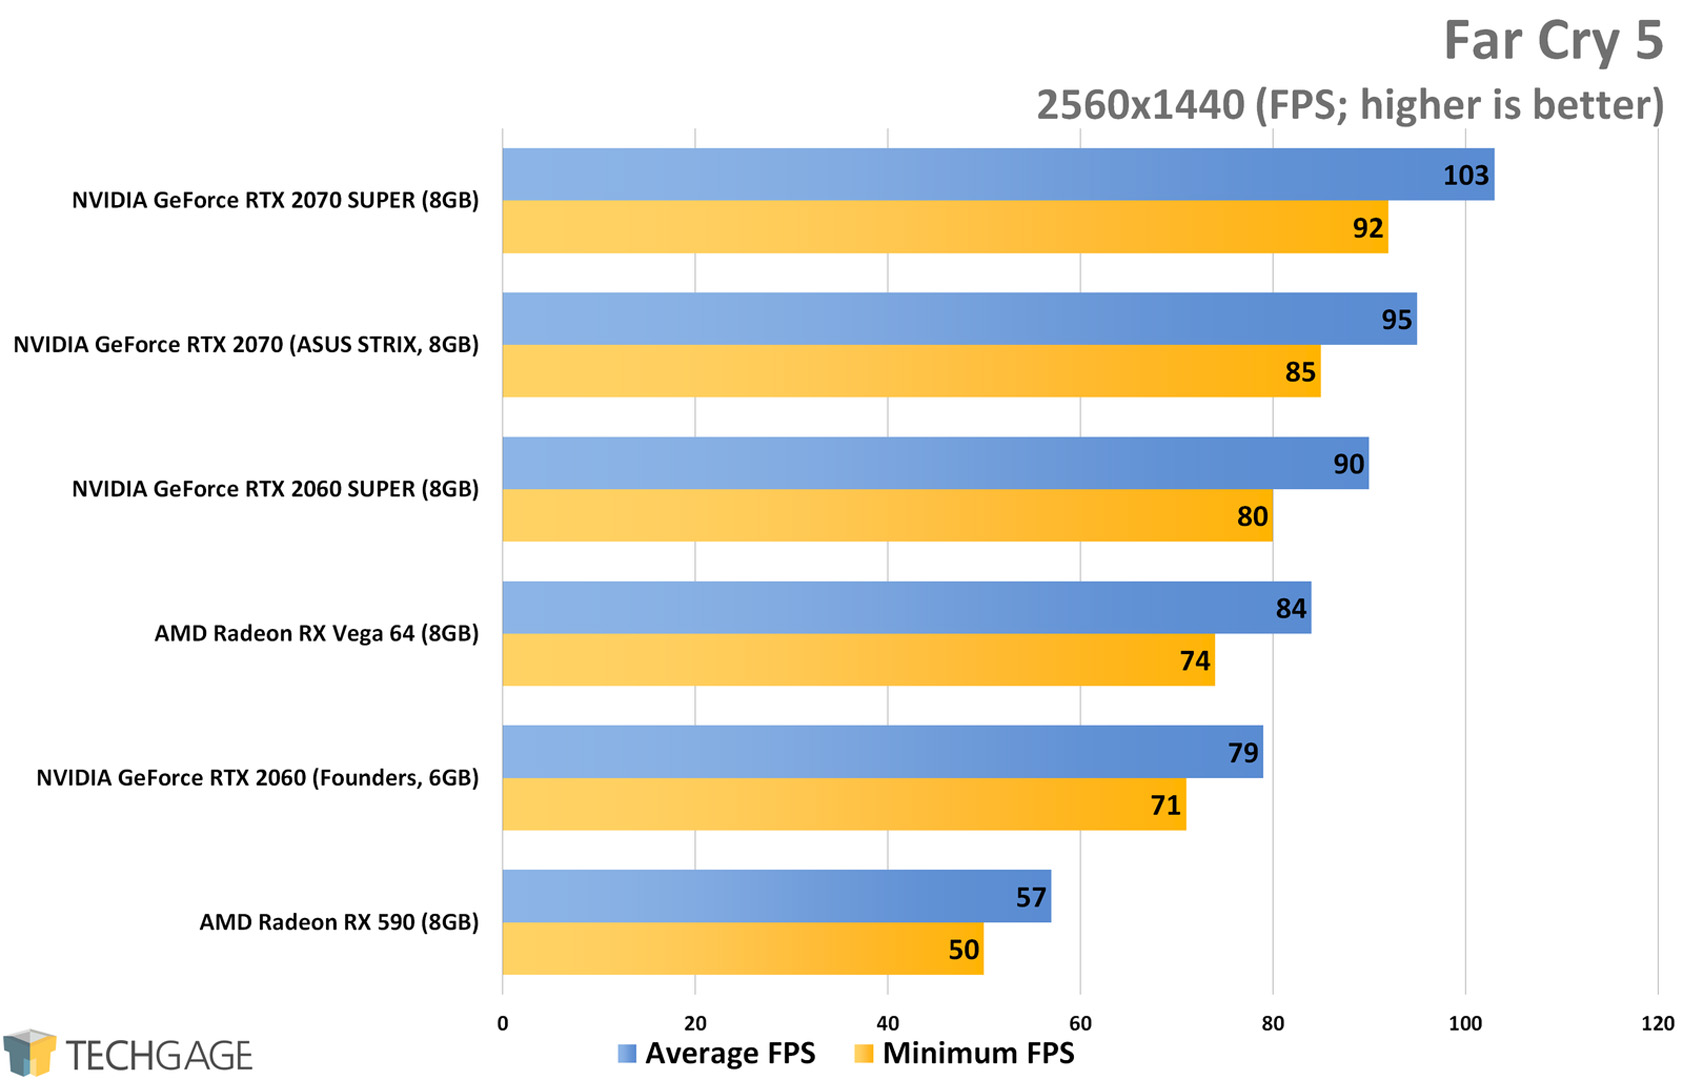 Far Cry 5 (1440p) - NVIDIA RTX SUPER 2060 and 2070 Performance